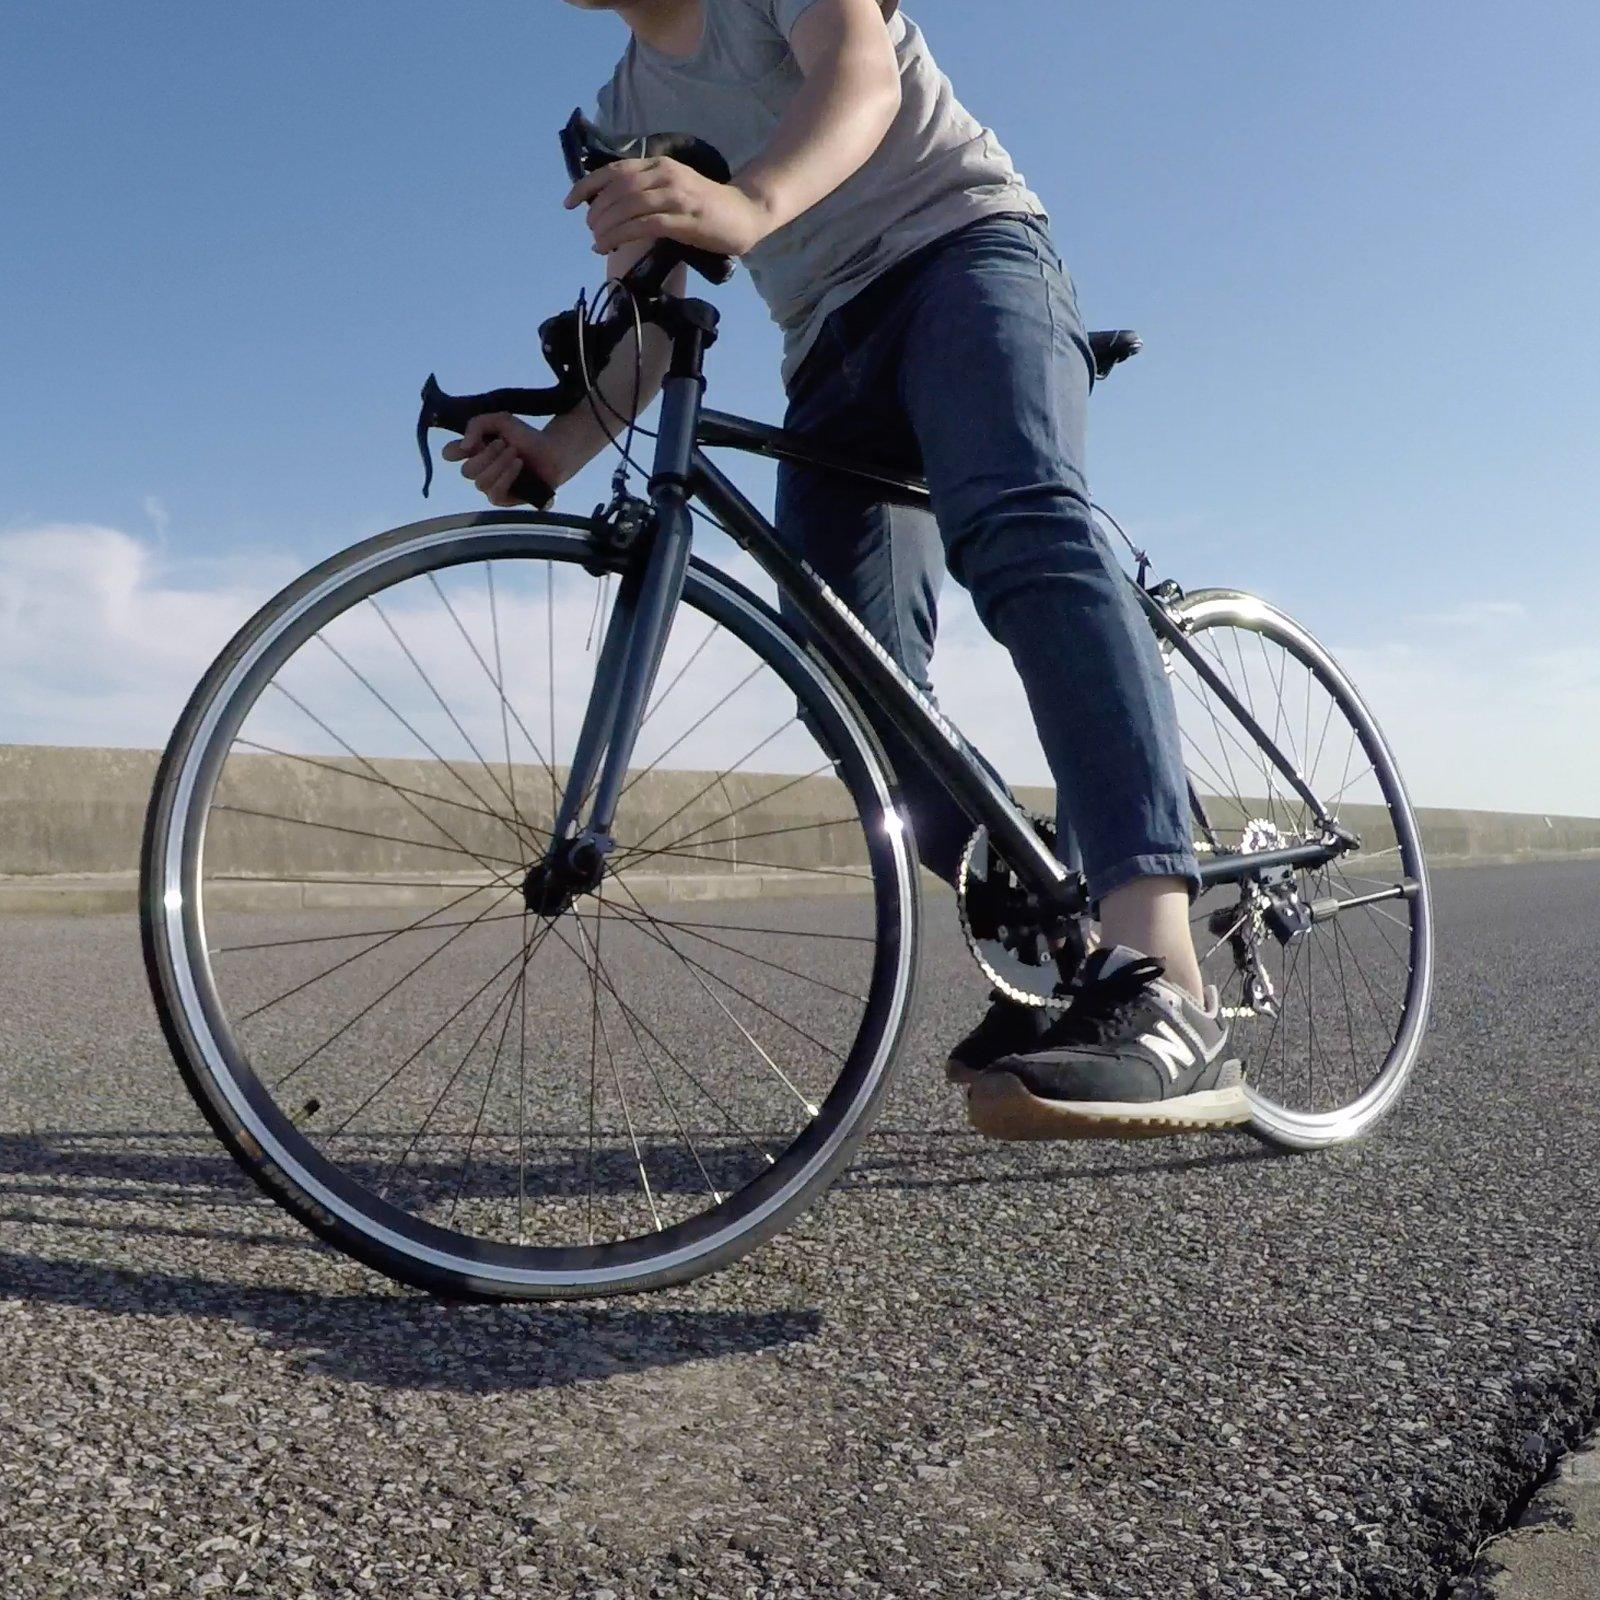 Solomone Cavalli Lightweight Classic Sports 8 Speed 700C Medium Road Bicycle Bike w/Shimano Derailleur by Solomone Cavalli (Image #3)